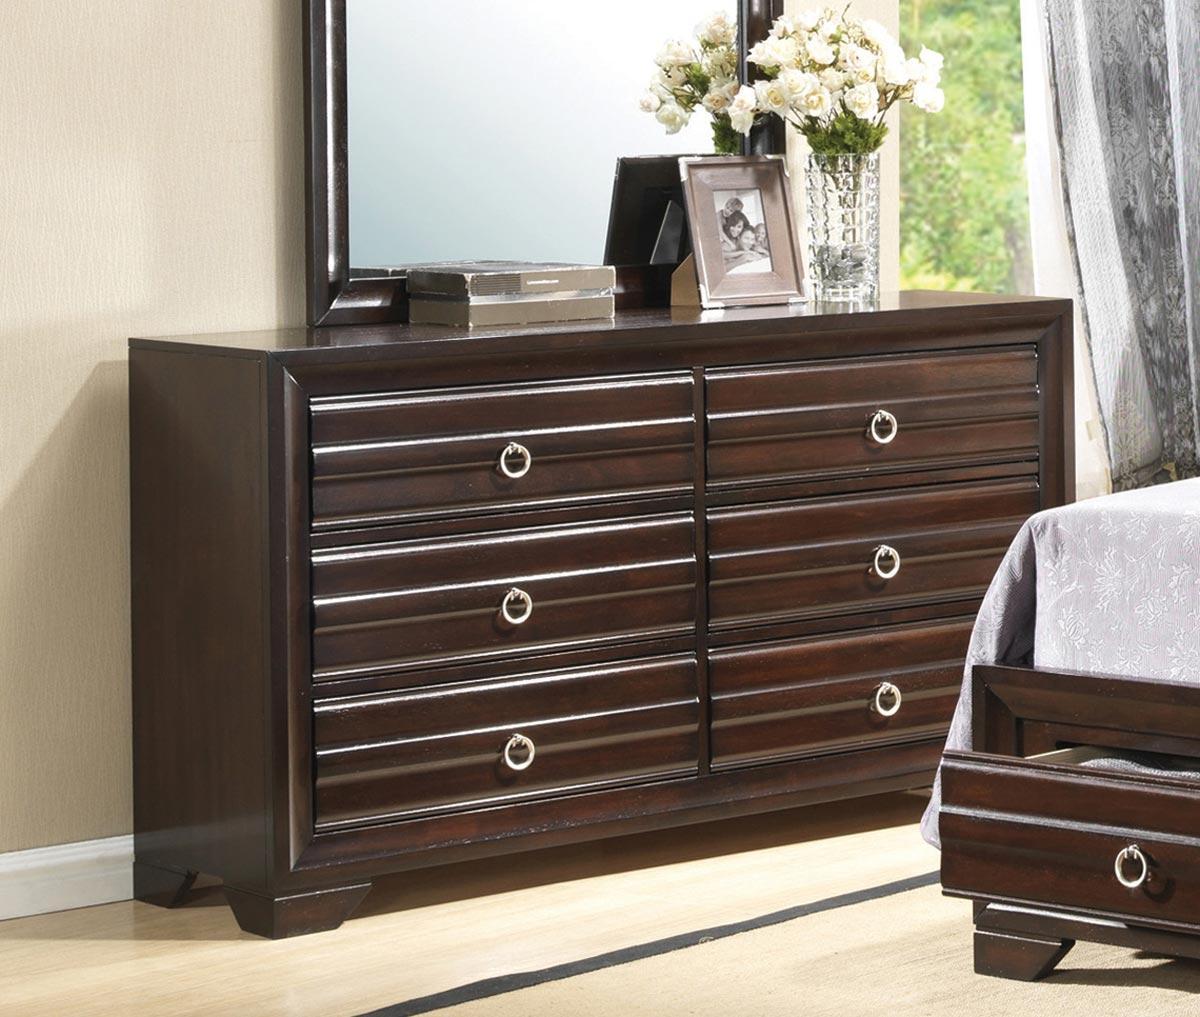 Coaster Bryce Dresser - Cappuccino